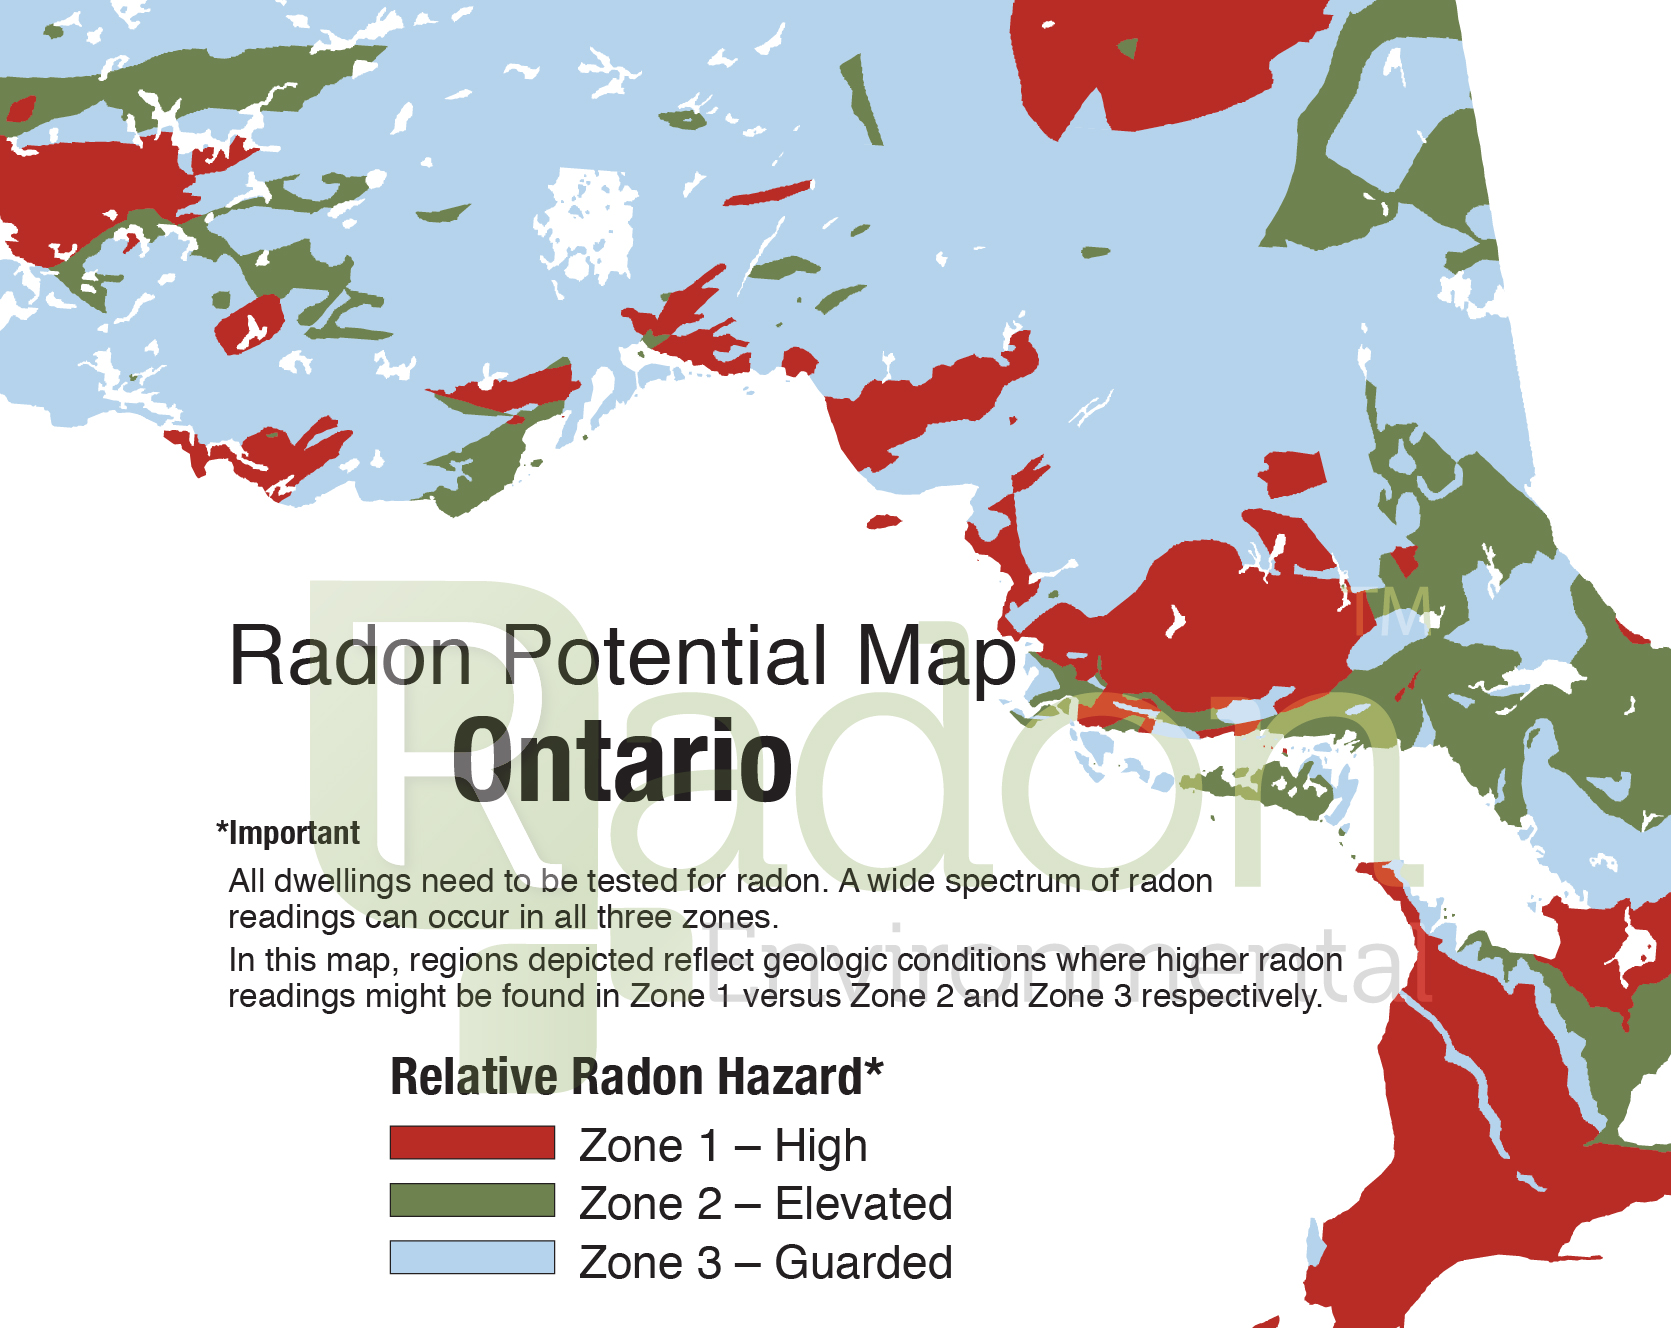 Radon Potential Map of Ontario.